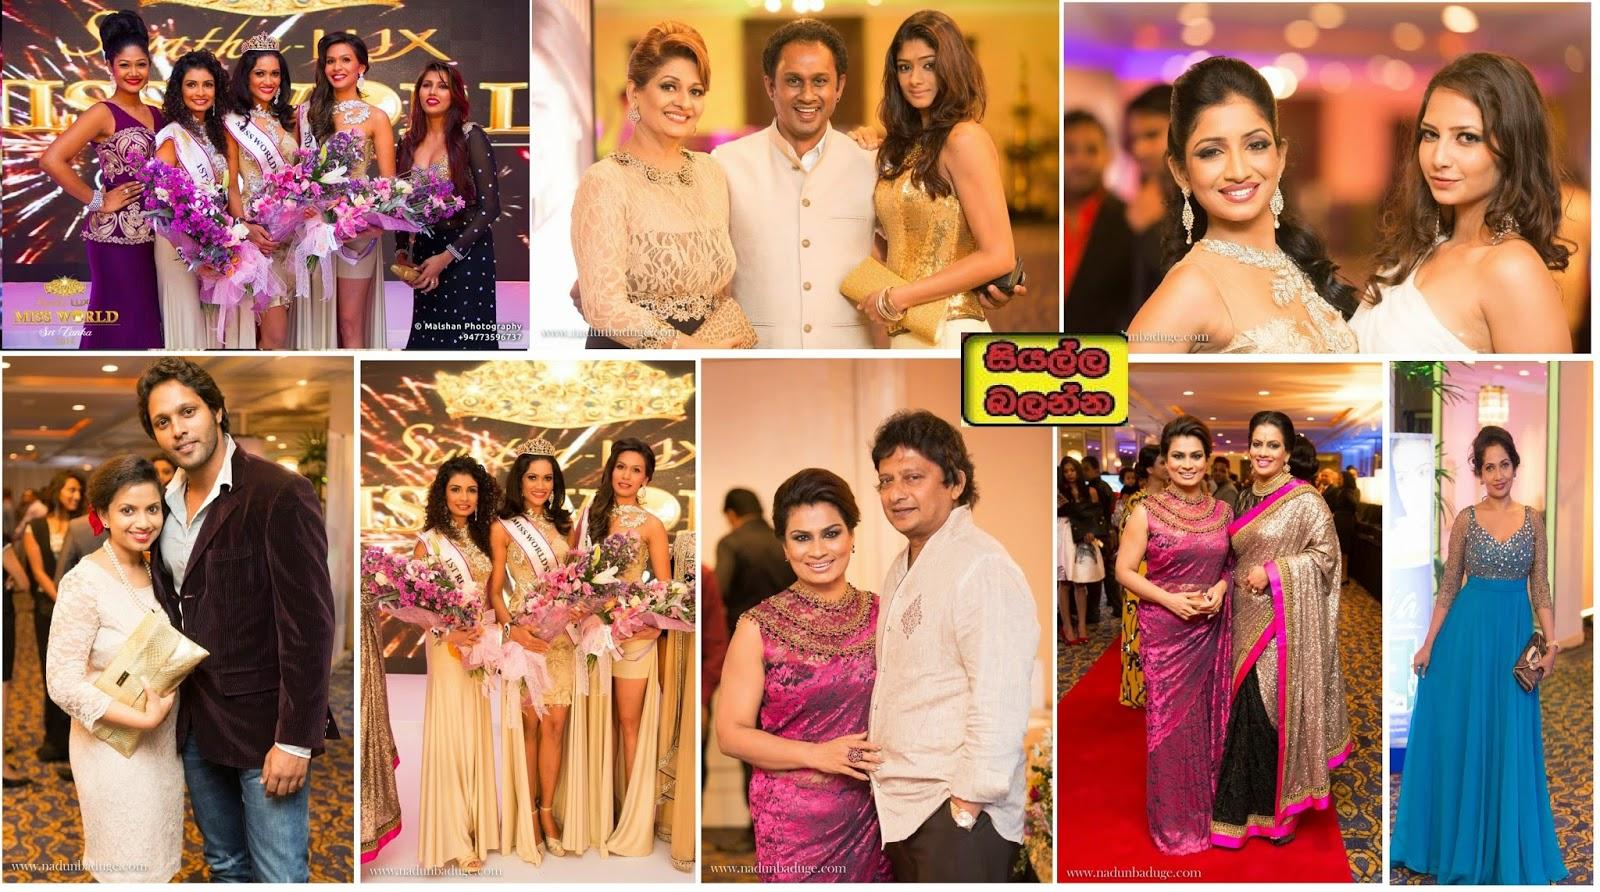 http://picture.gossiplankahotnews.com/2014/08/siyatha-lux-miss-sri-lanka-grand-finale.html